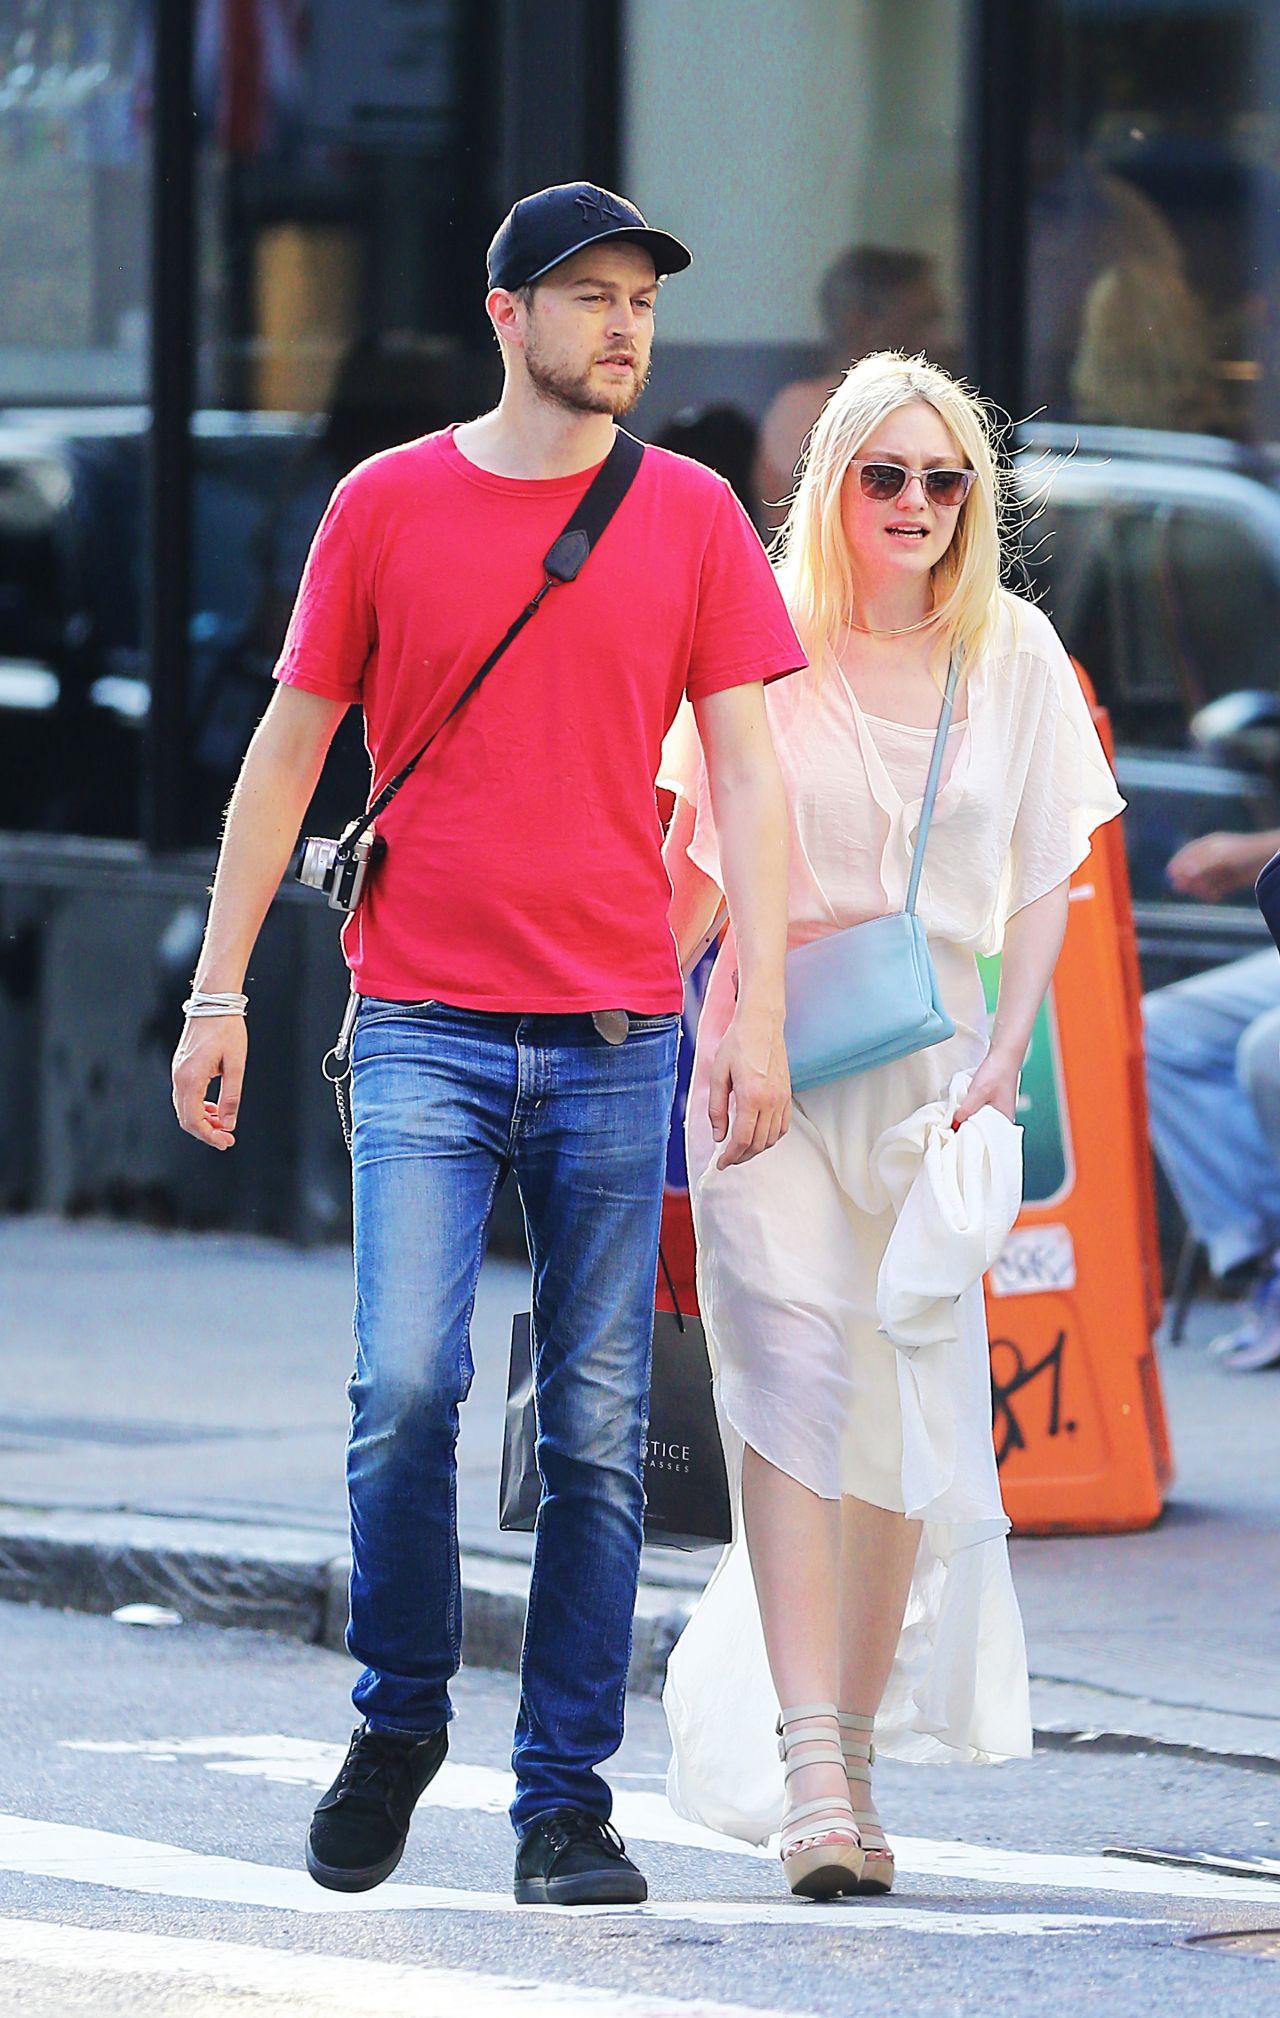 Who Is Elle Fanning Dating? Boyfriend Details, Net Worth